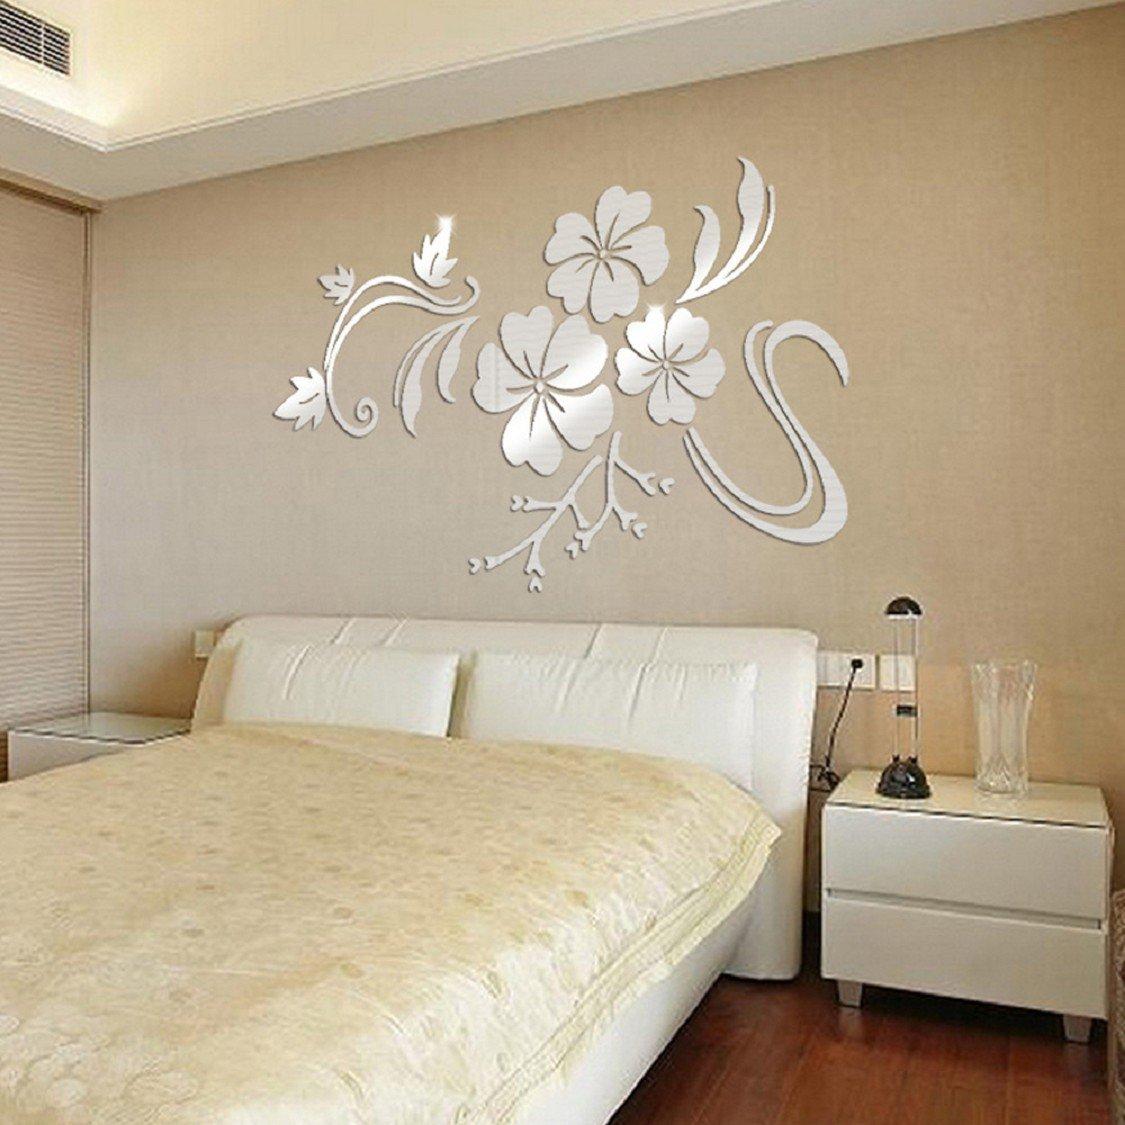 Amazon.com: Wall Stickers,GOODCULLER 50PC Acrylic Art 3D Wall Mirror ...